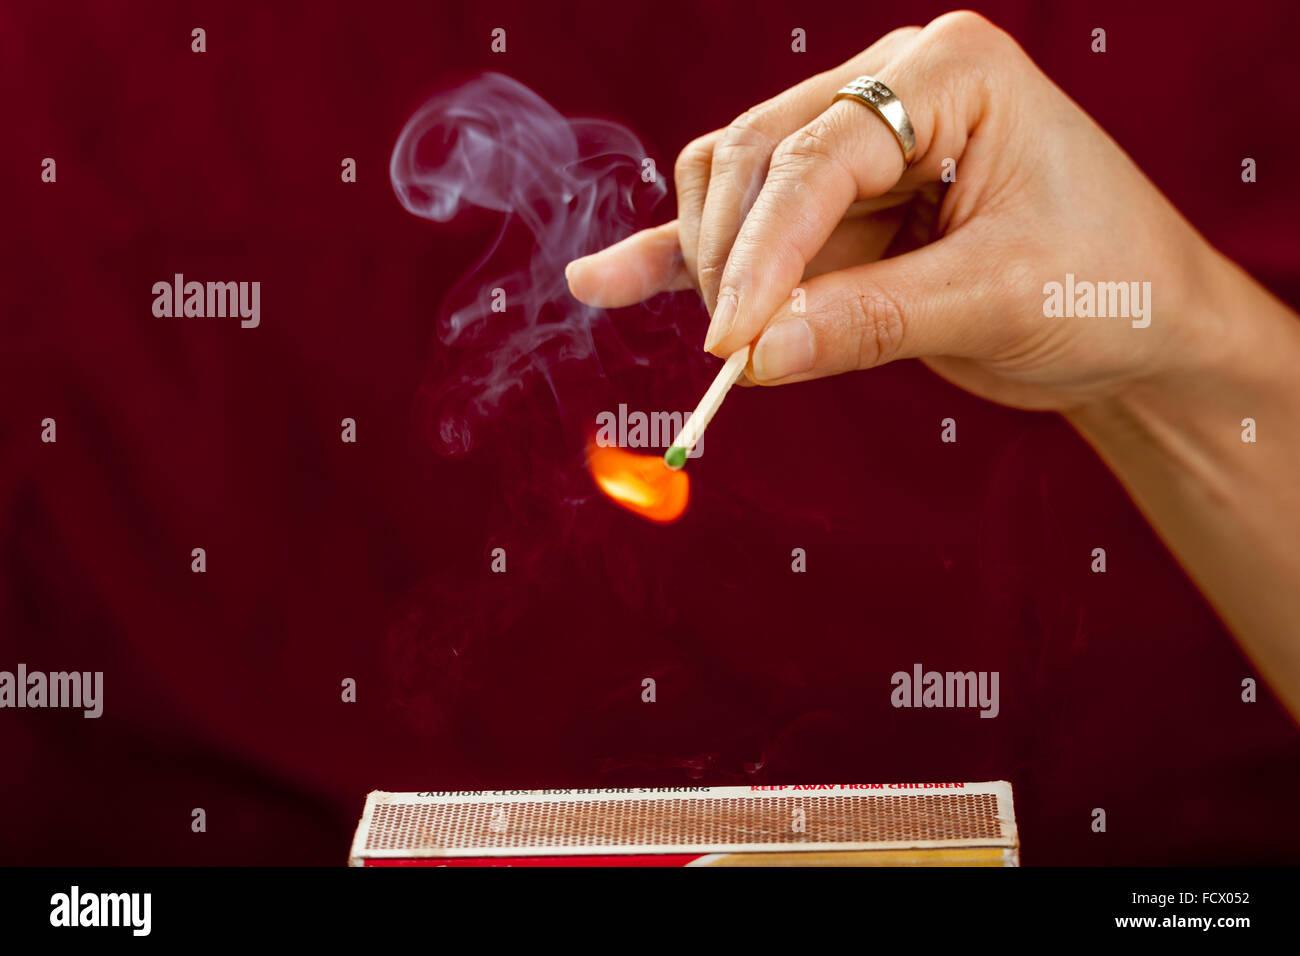 Striking a match. - Stock Image